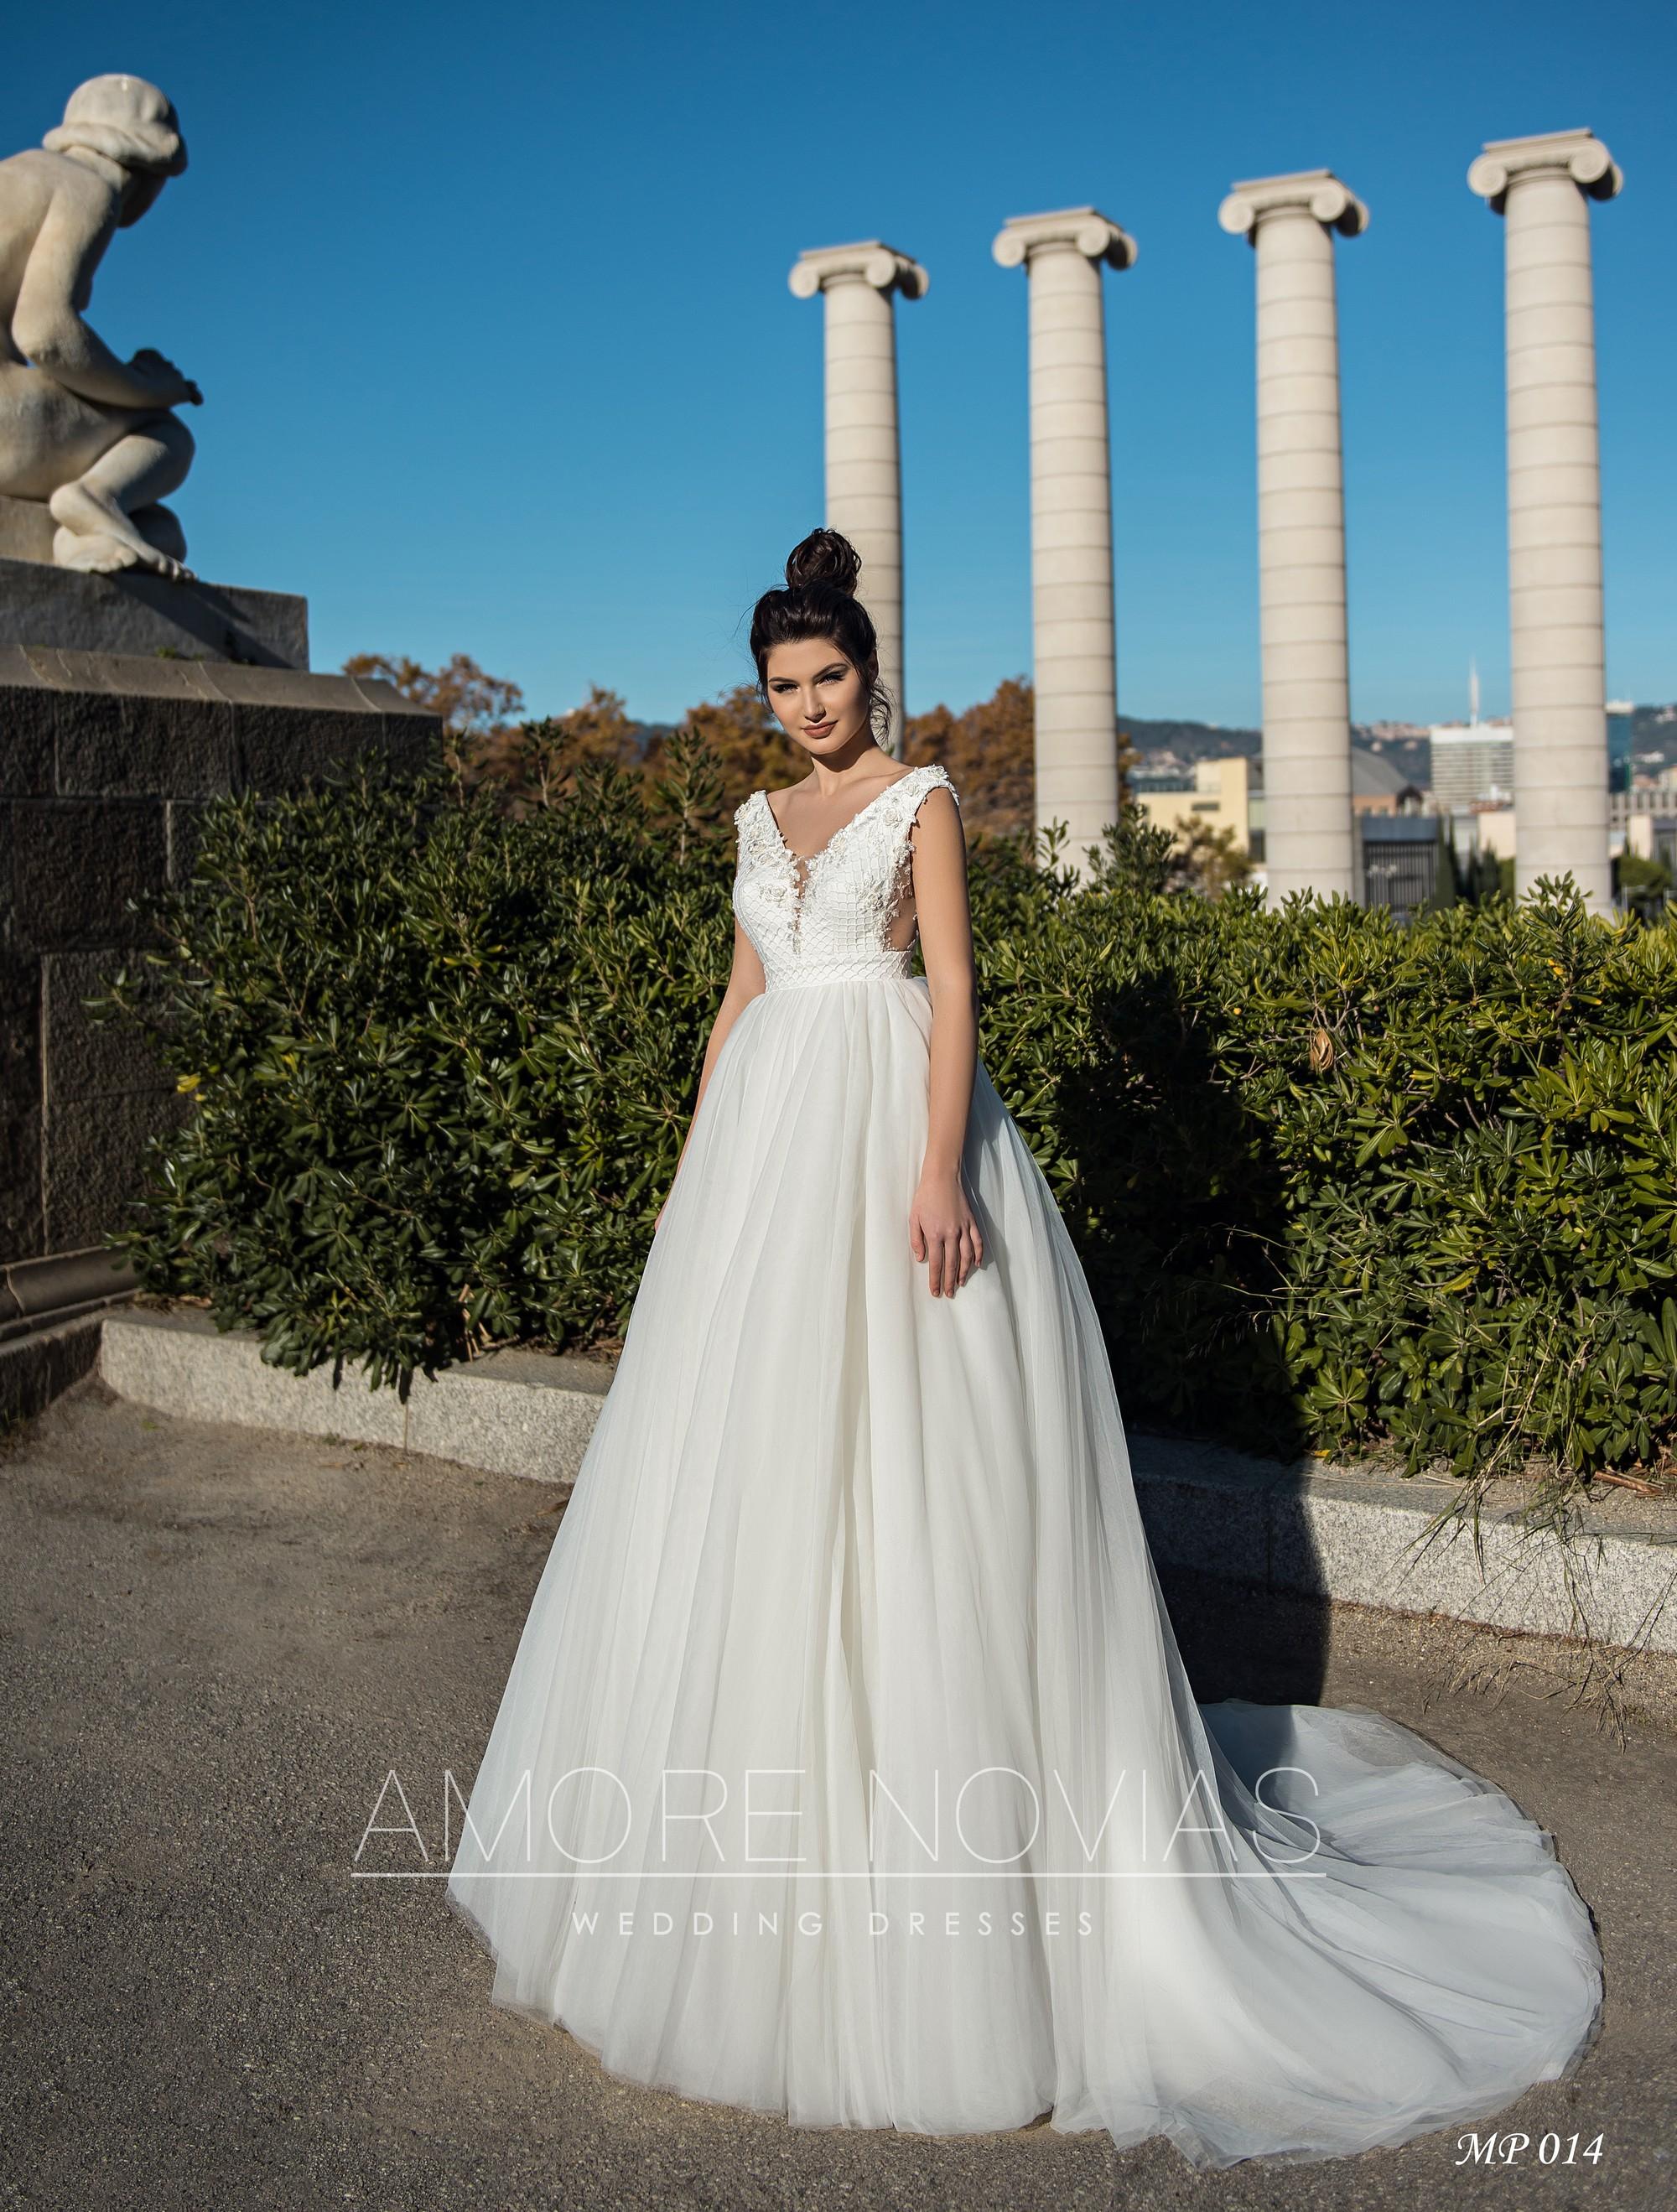 https://amore-novias.com/images/stories/virtuemart/product/mp-014--------(1).jpg